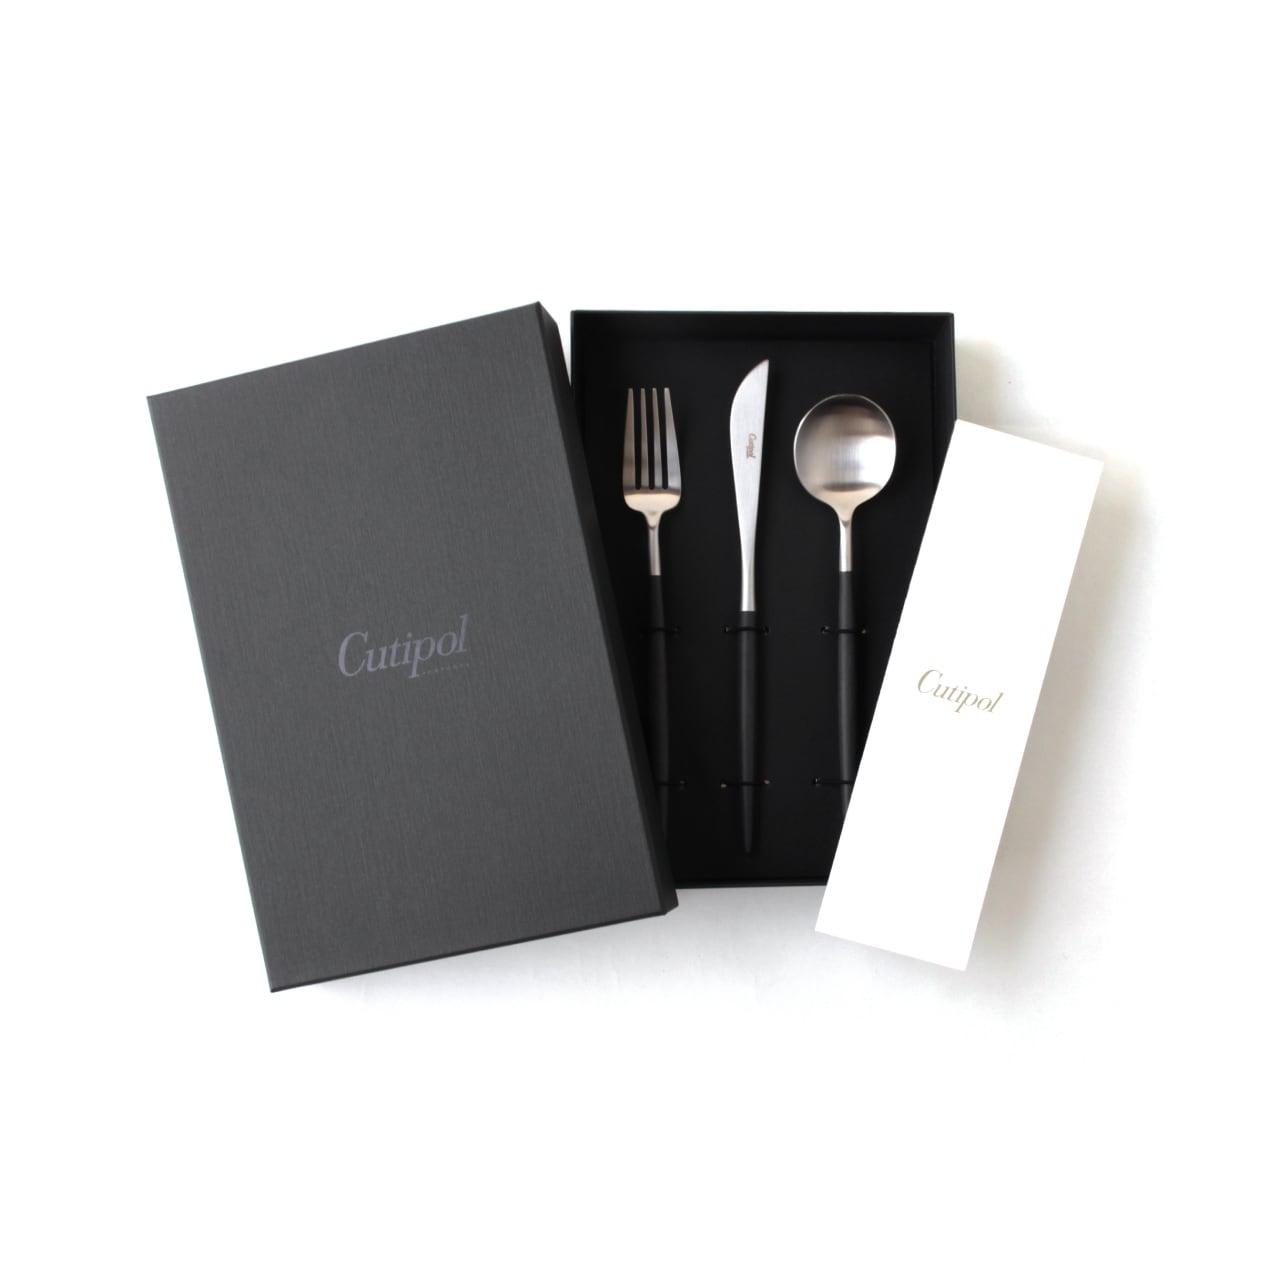 Cutipol GOA /クチポールゴア ギフトボックス ディナー3本セット